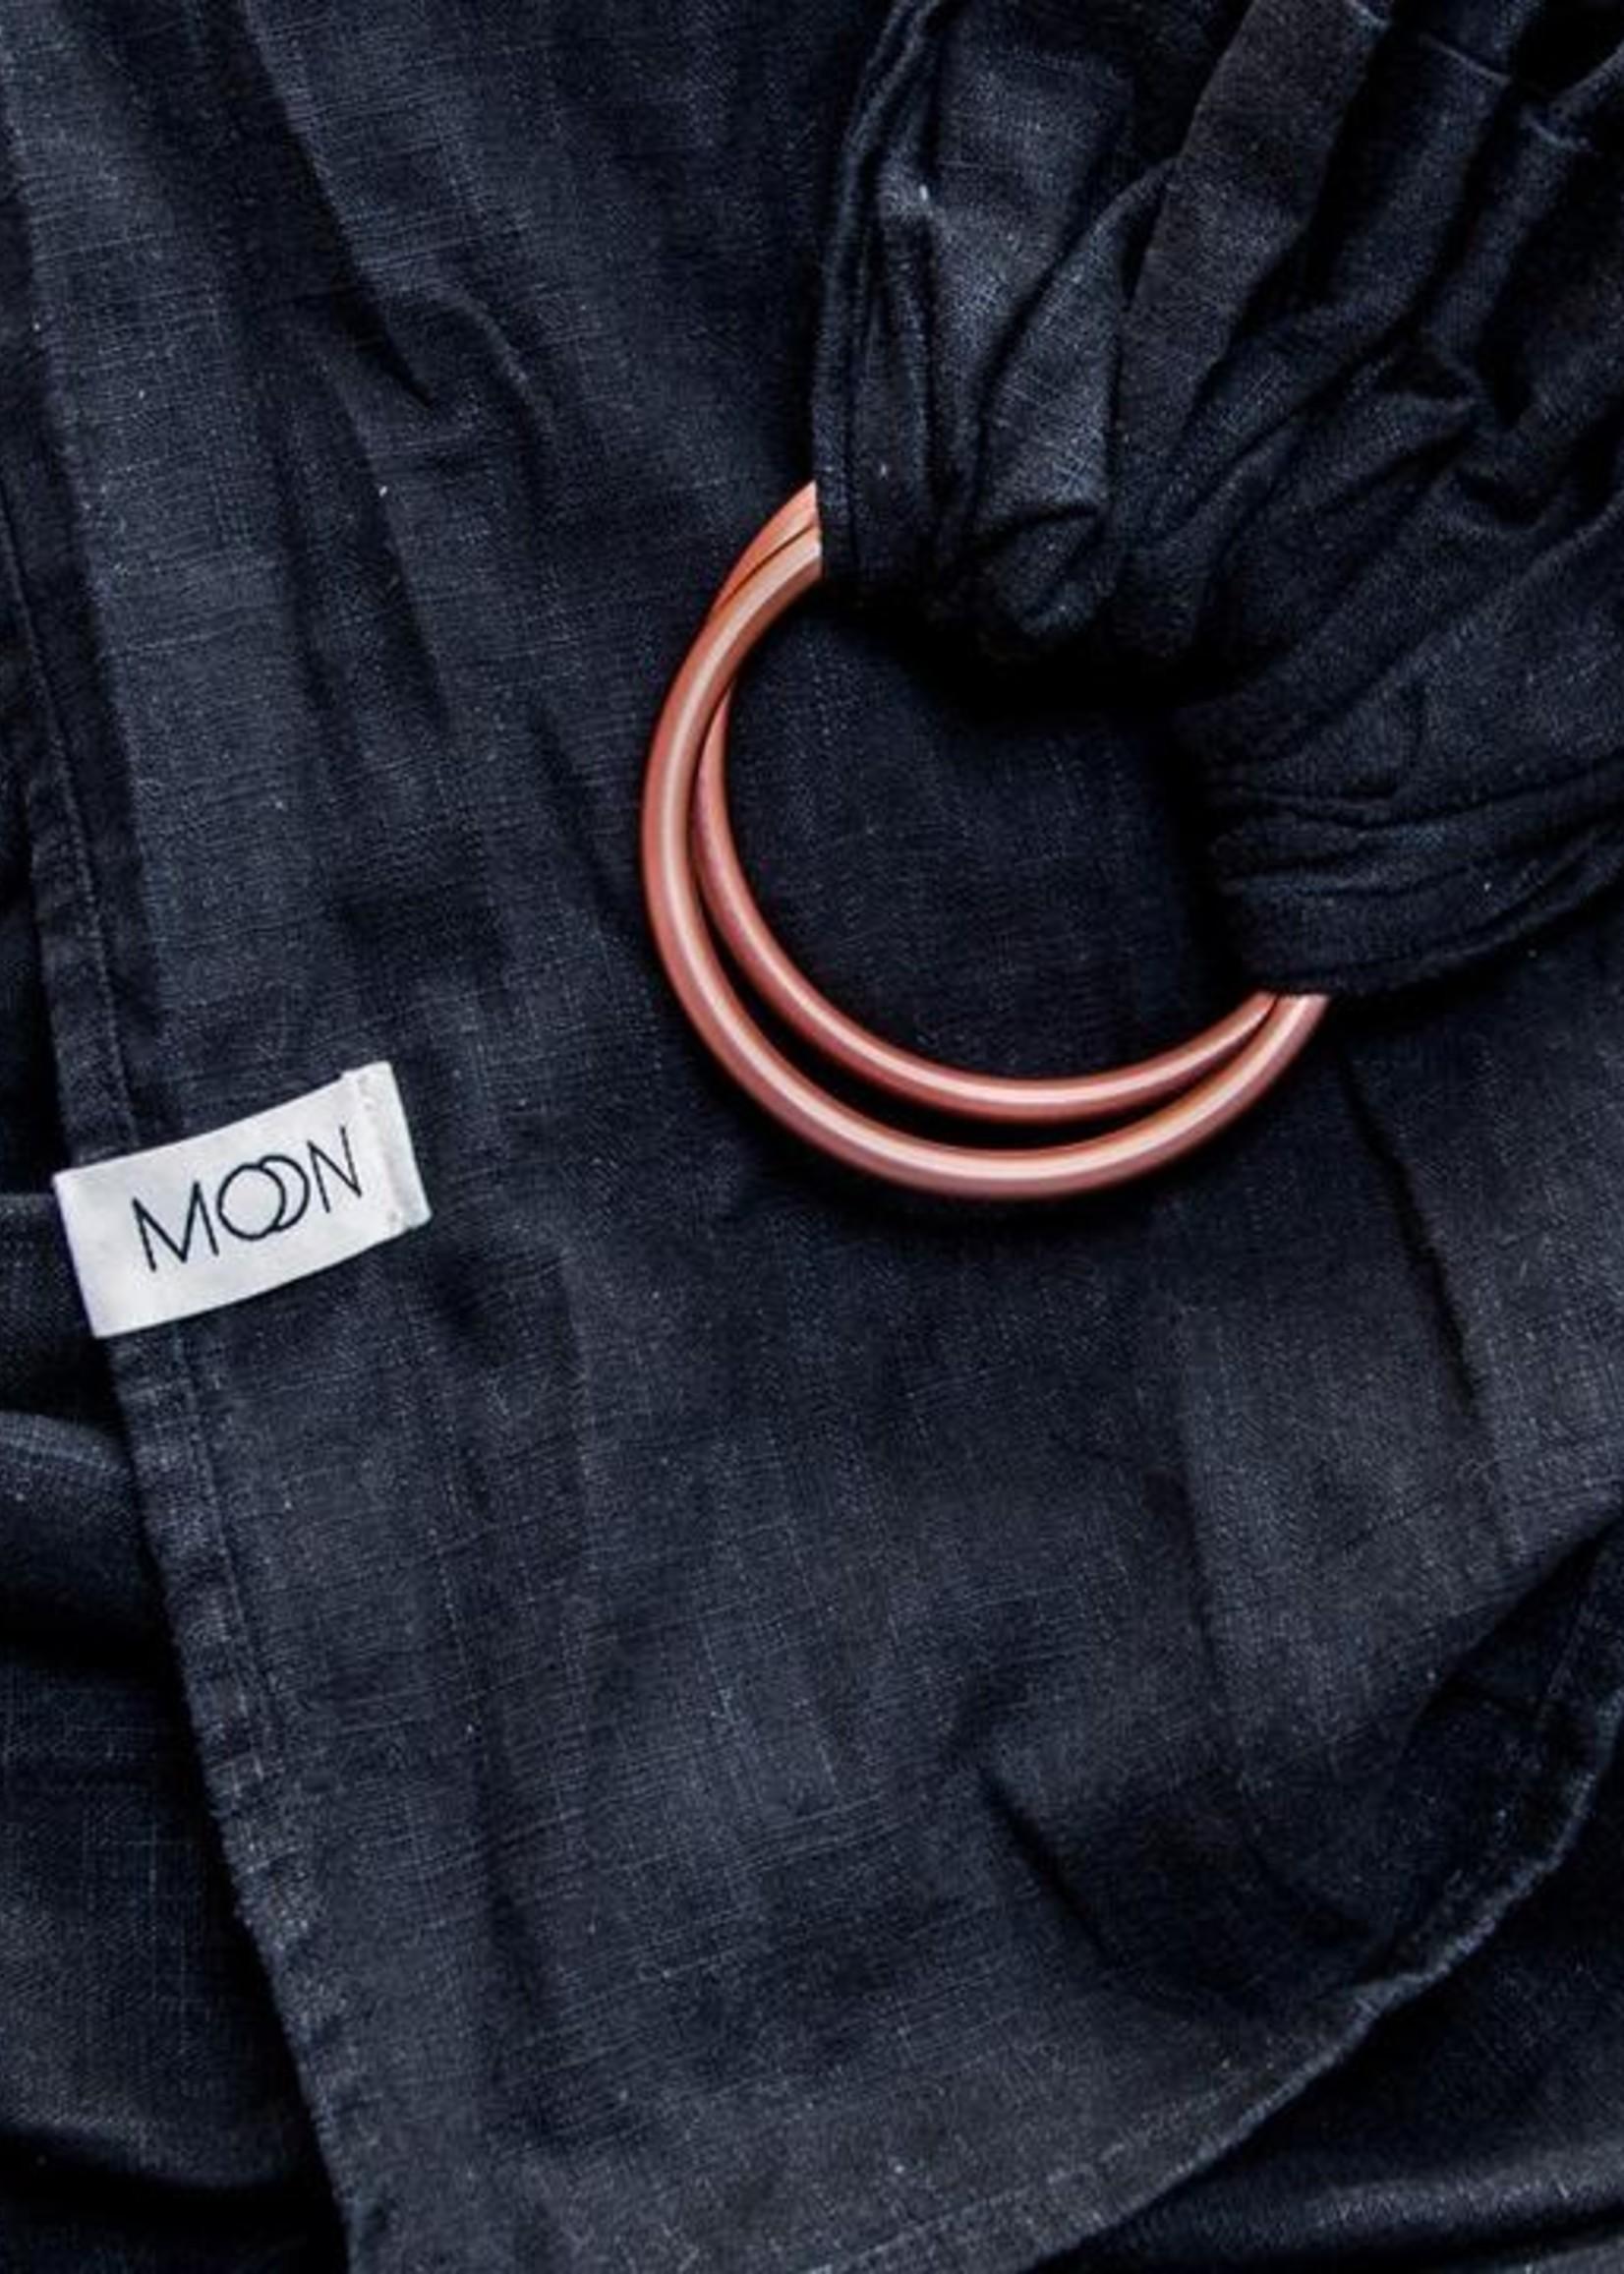 Moon Sling Black Moon